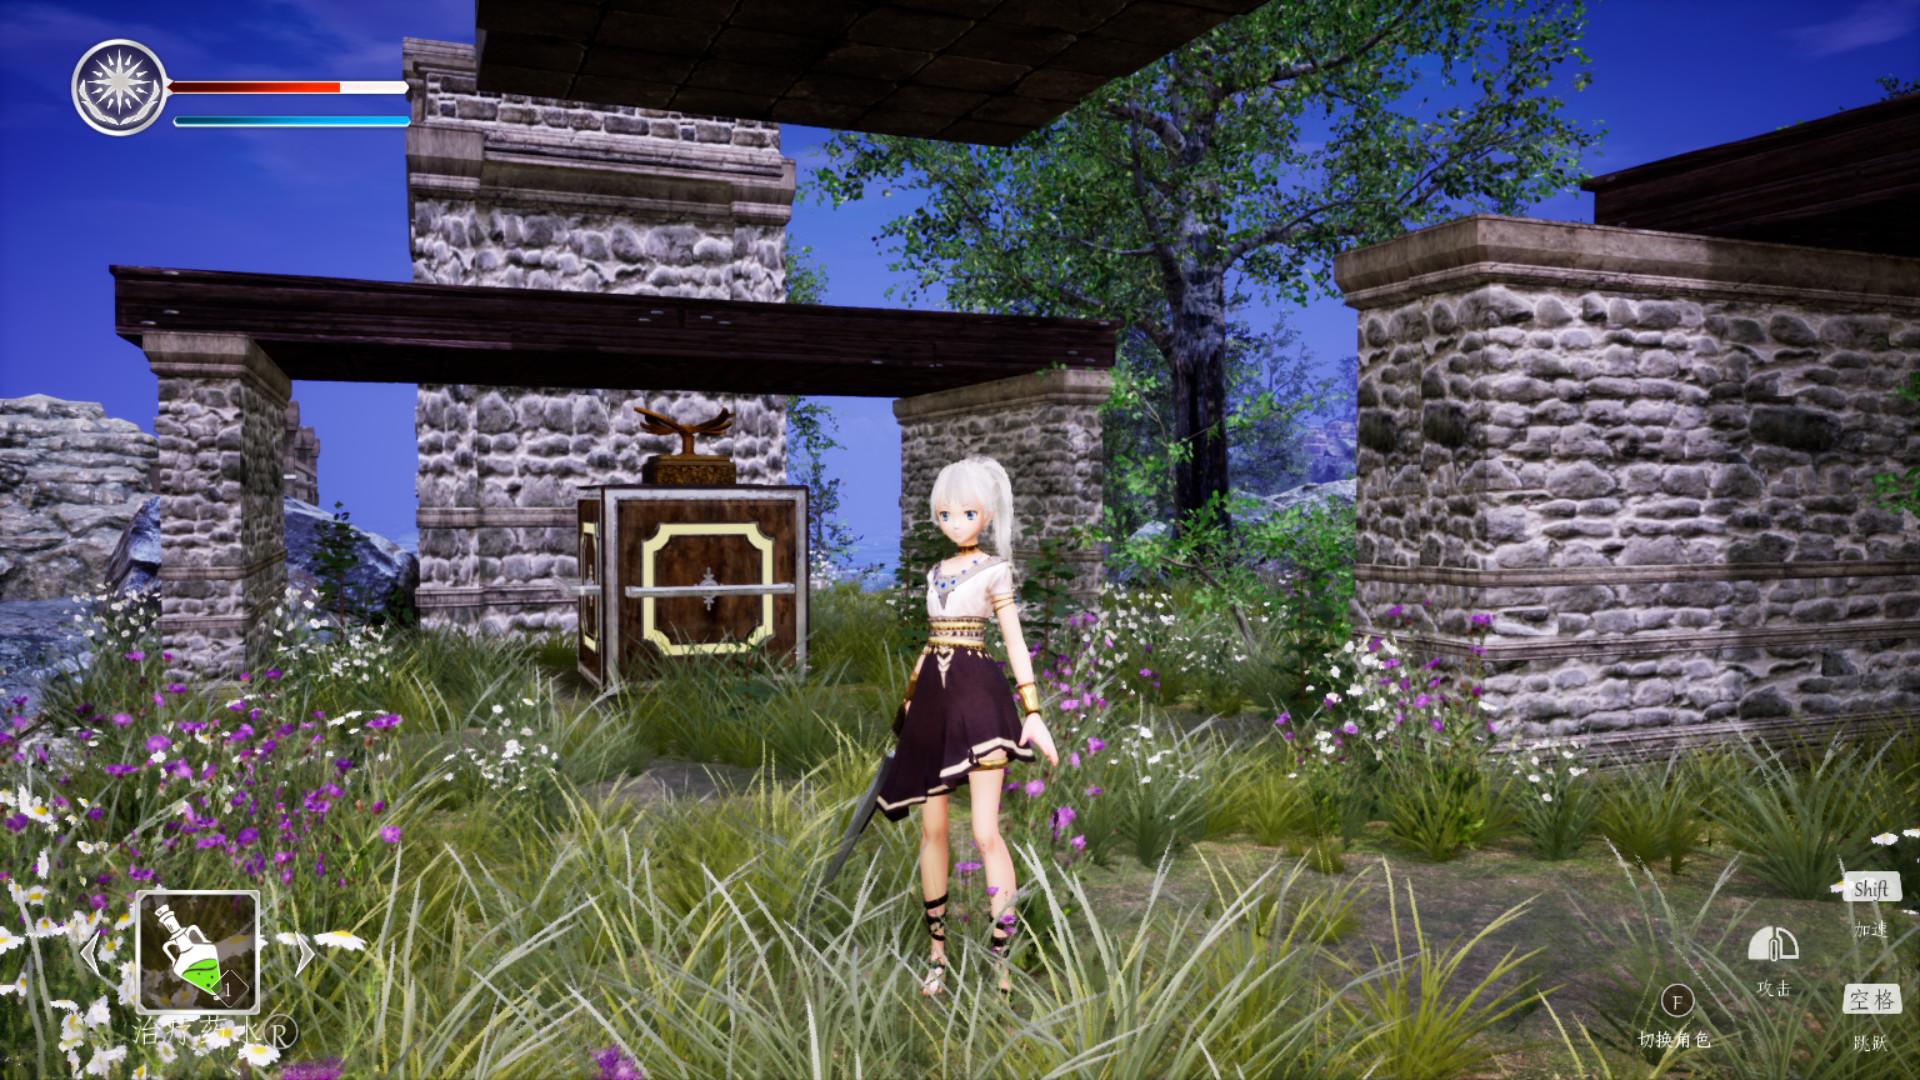 light-tracer-2-pc-screenshot-03